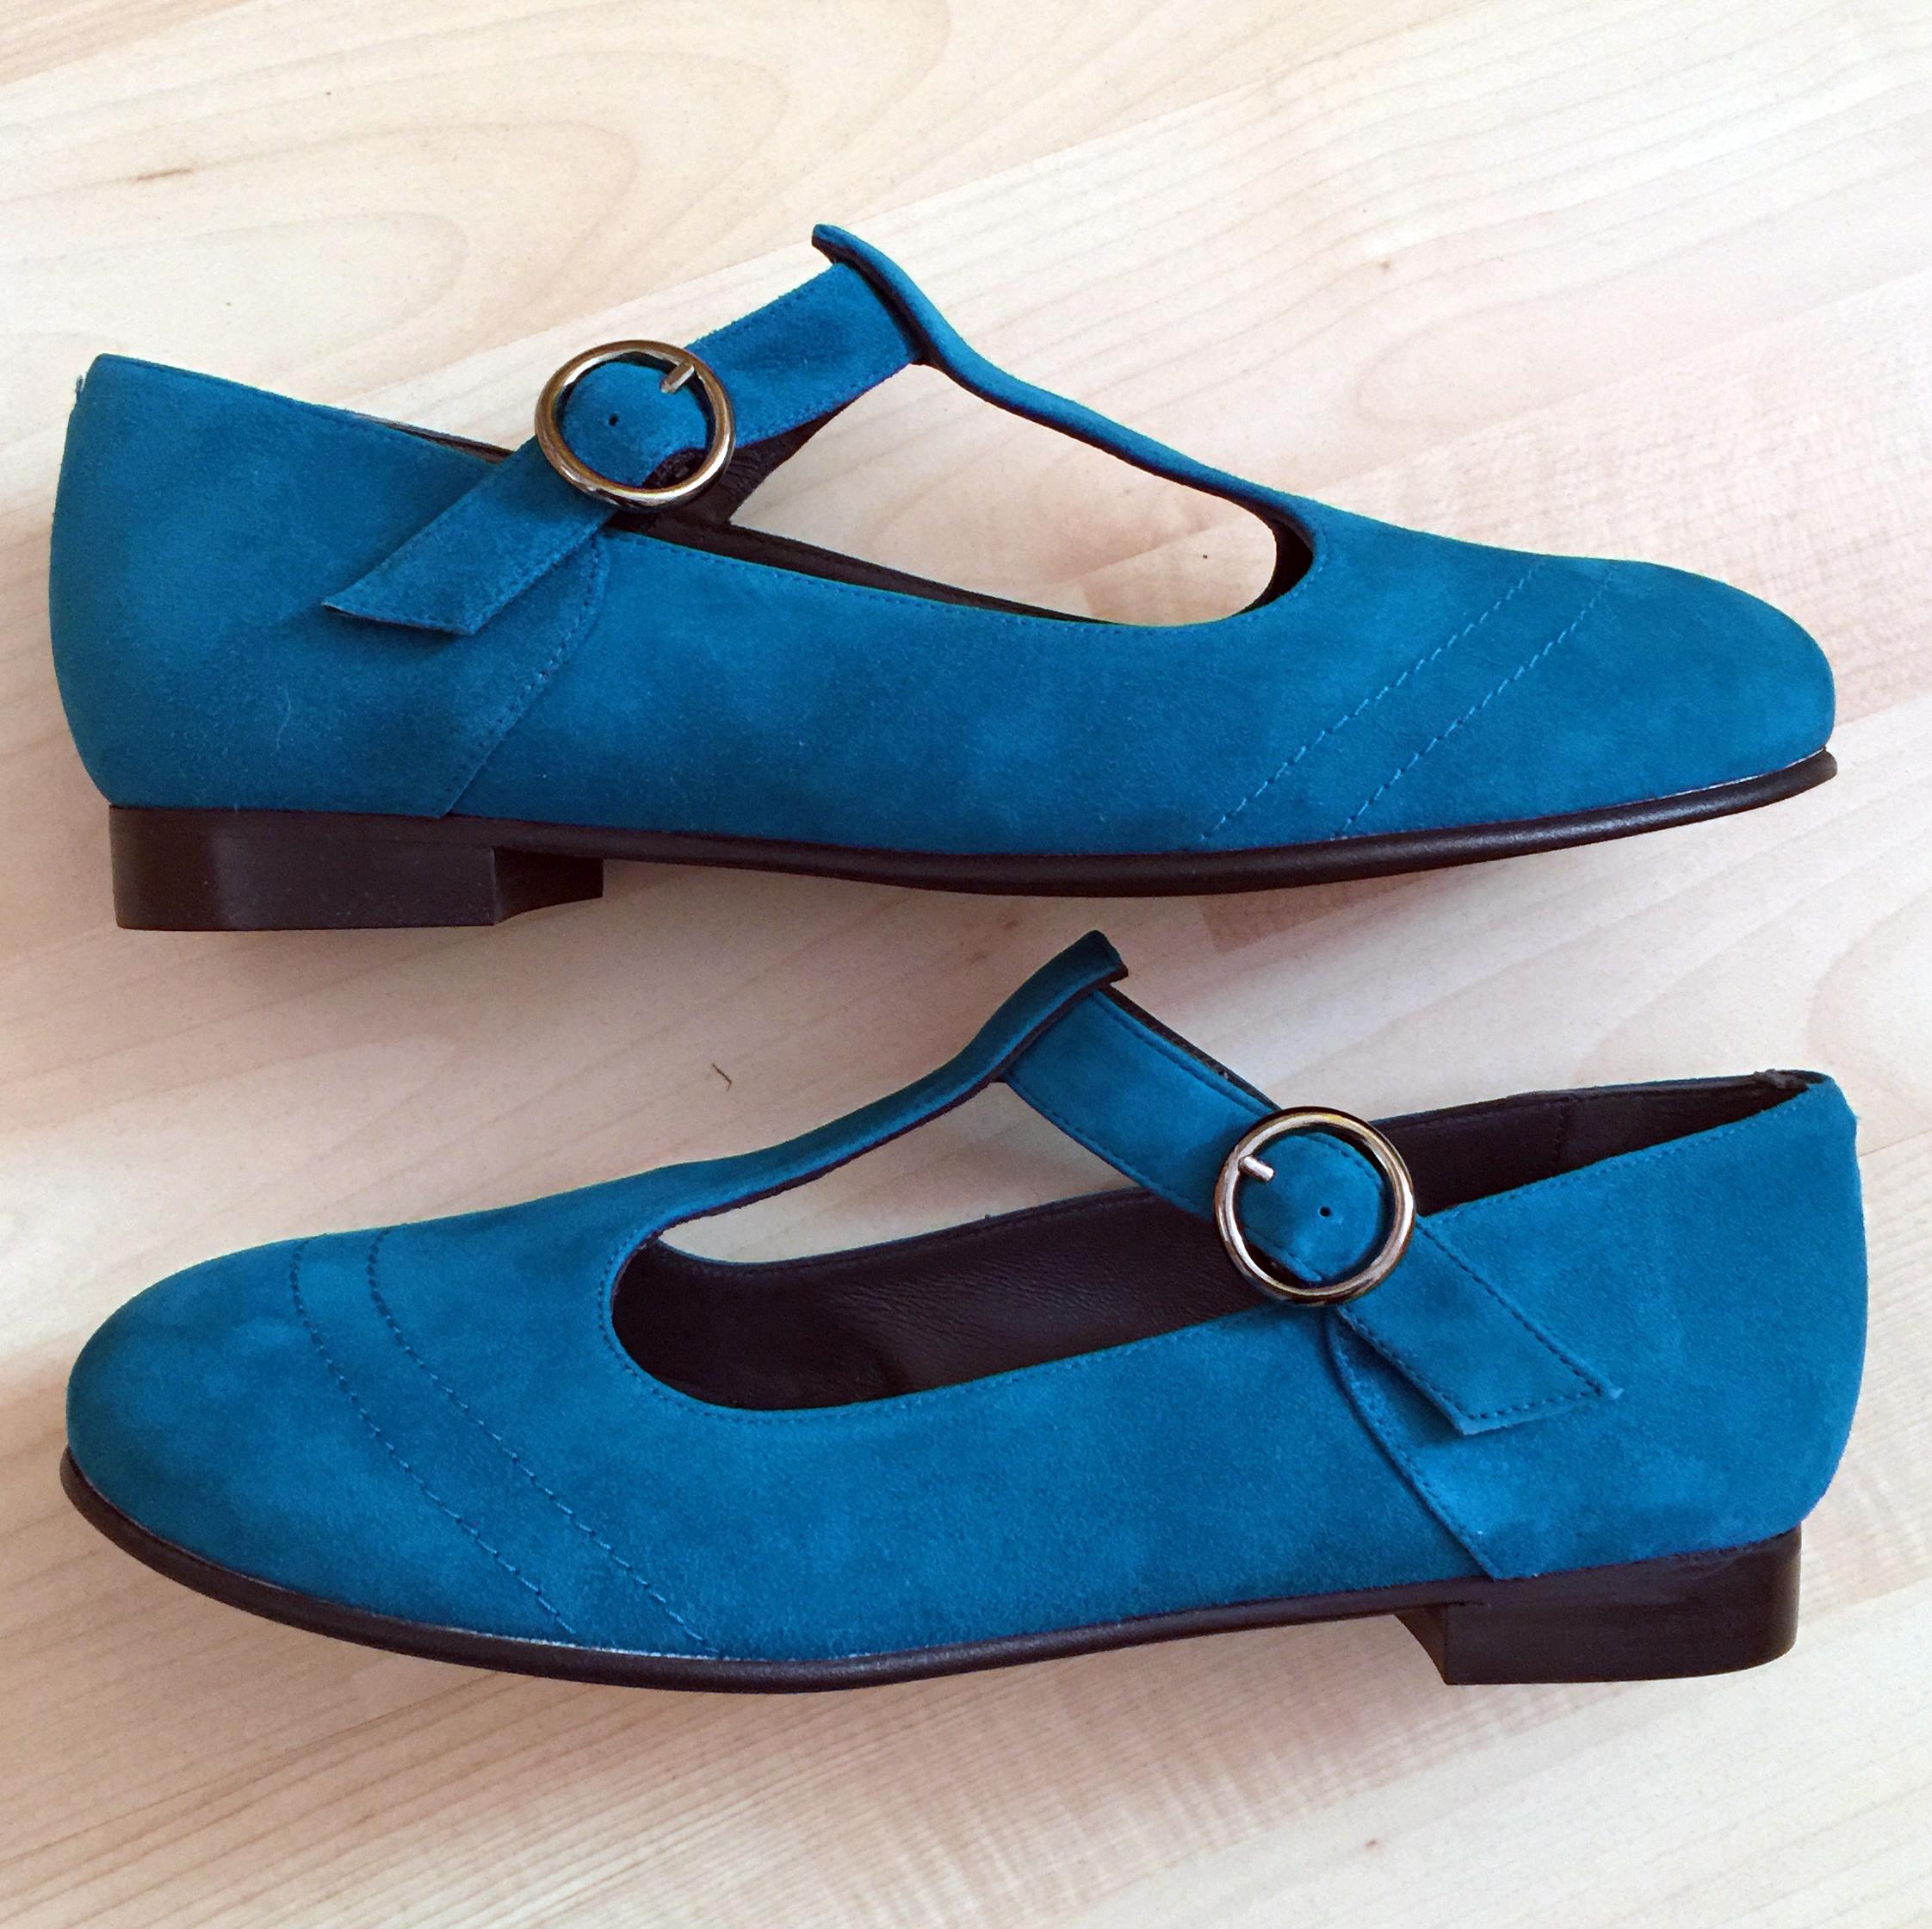 Tant Sofia-Saga Teal suede - Nordic Shoepeople